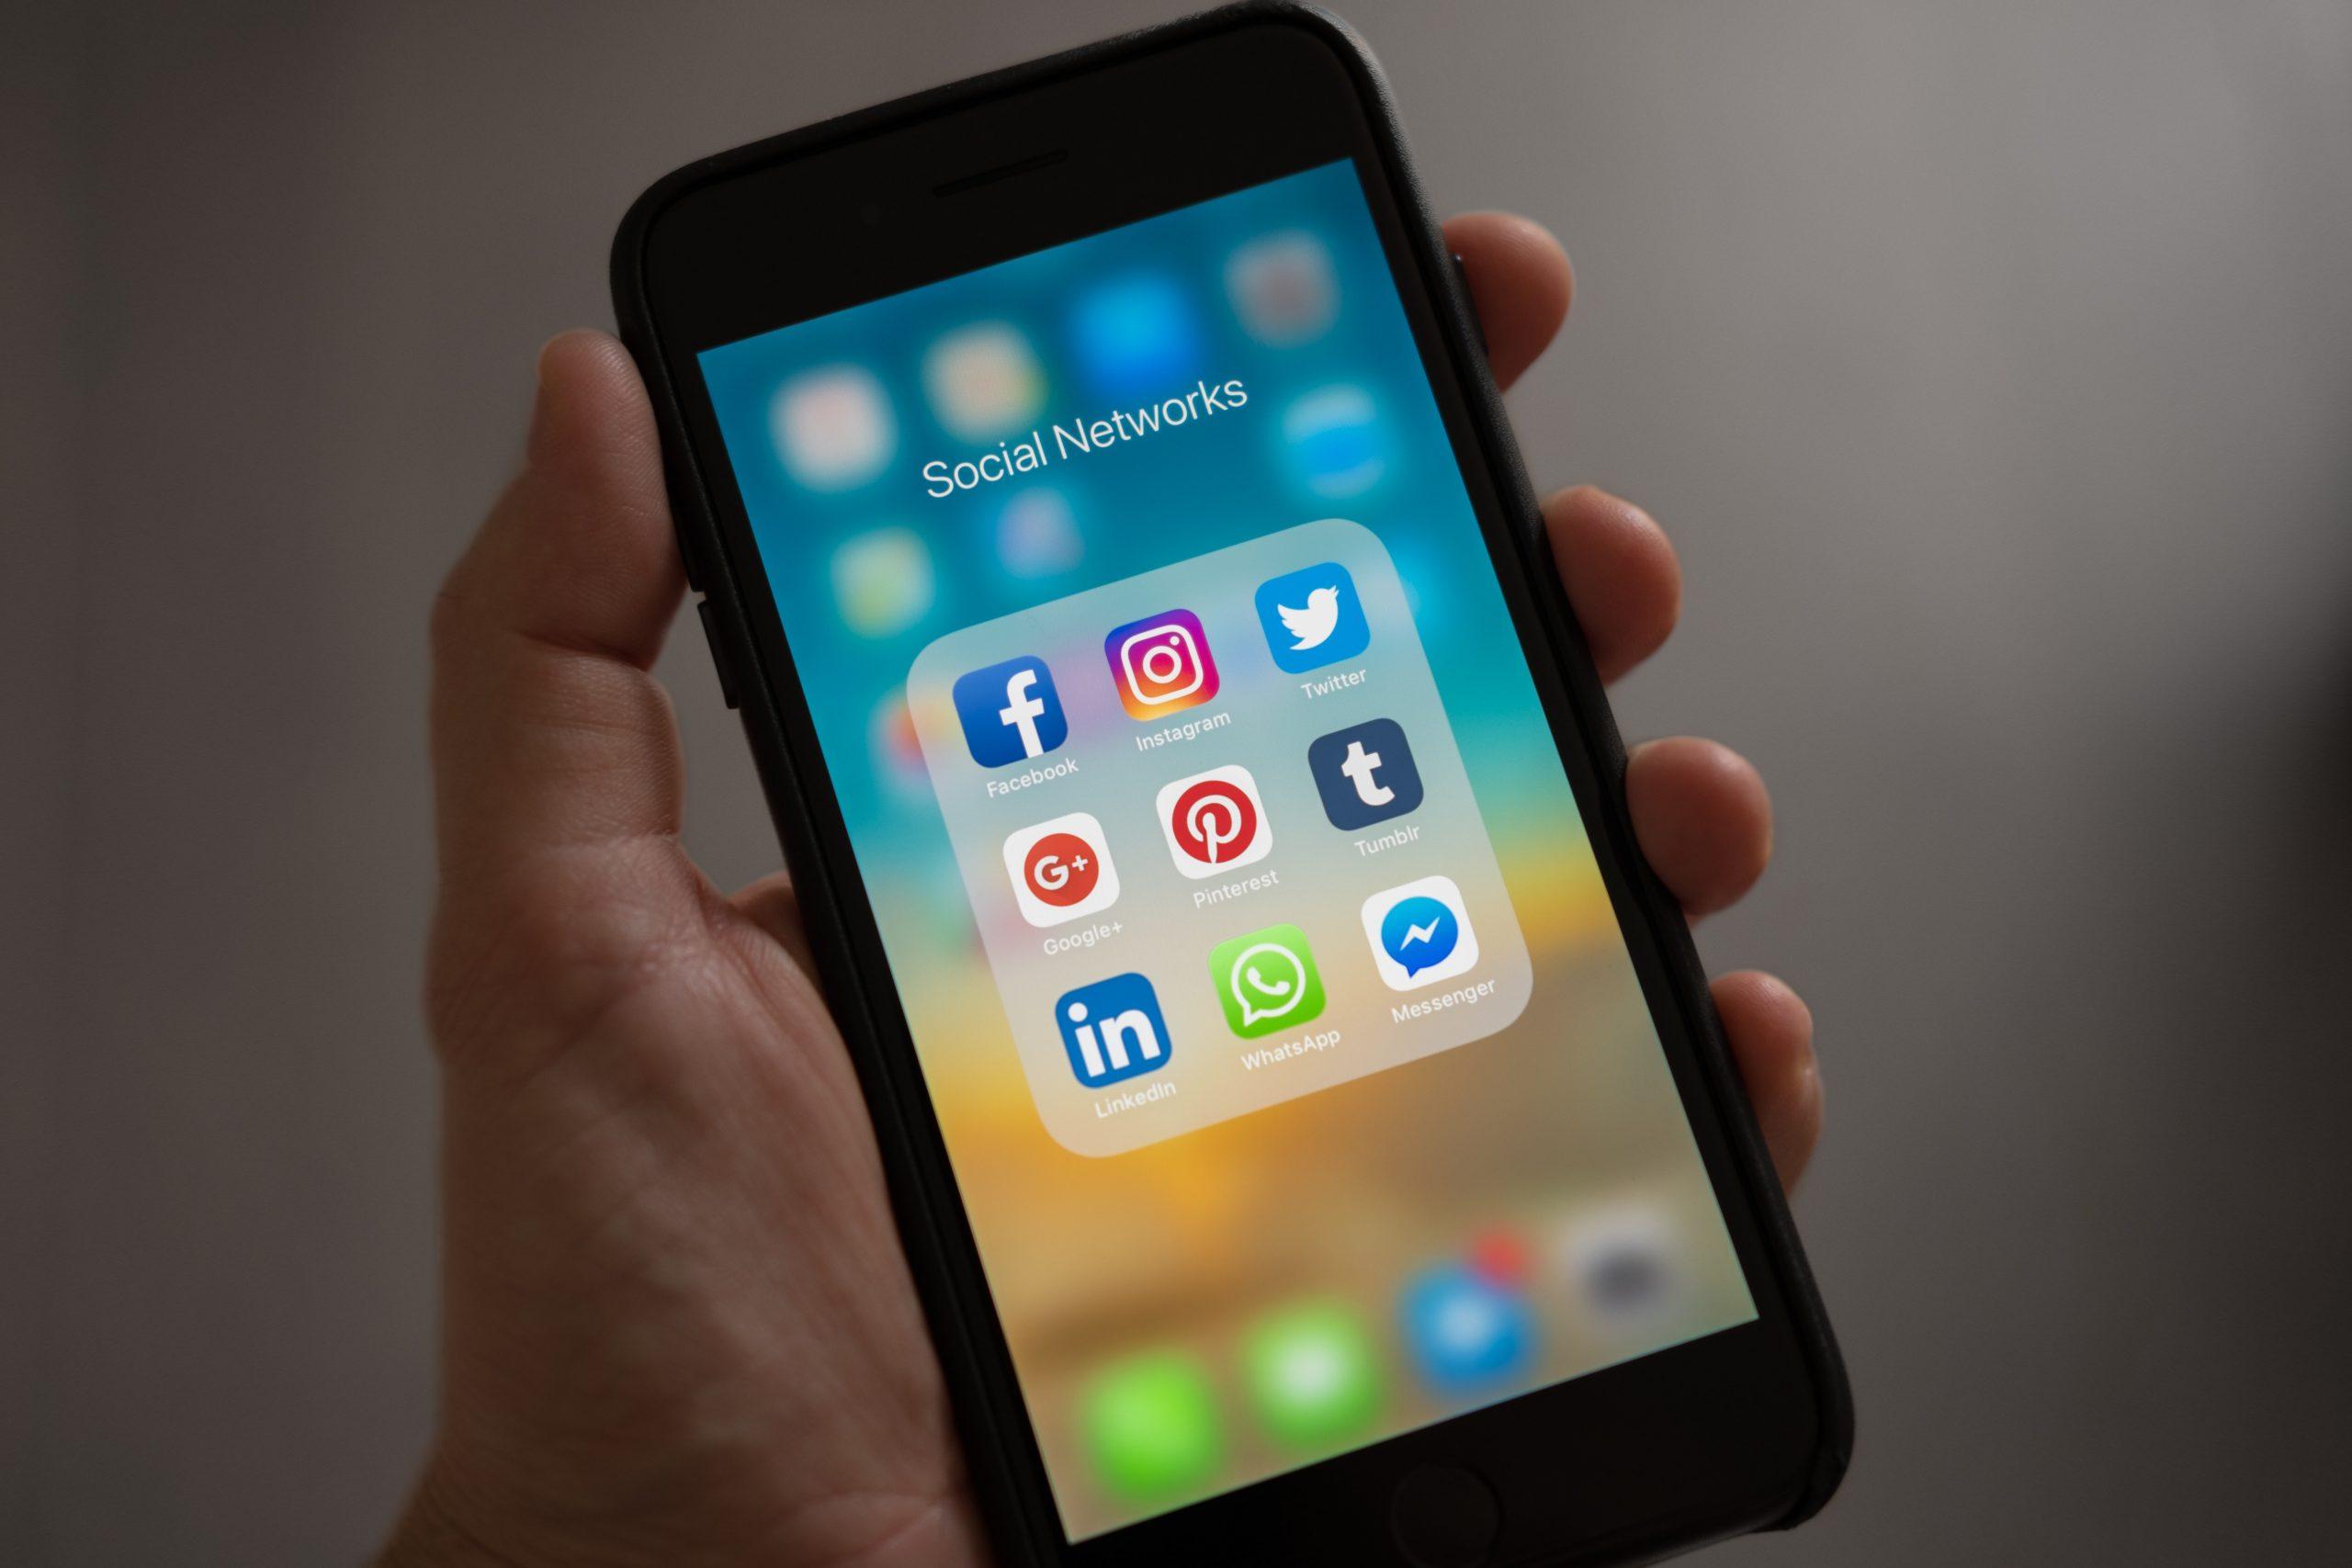 Chancen der Corona-Krise durch Social Media